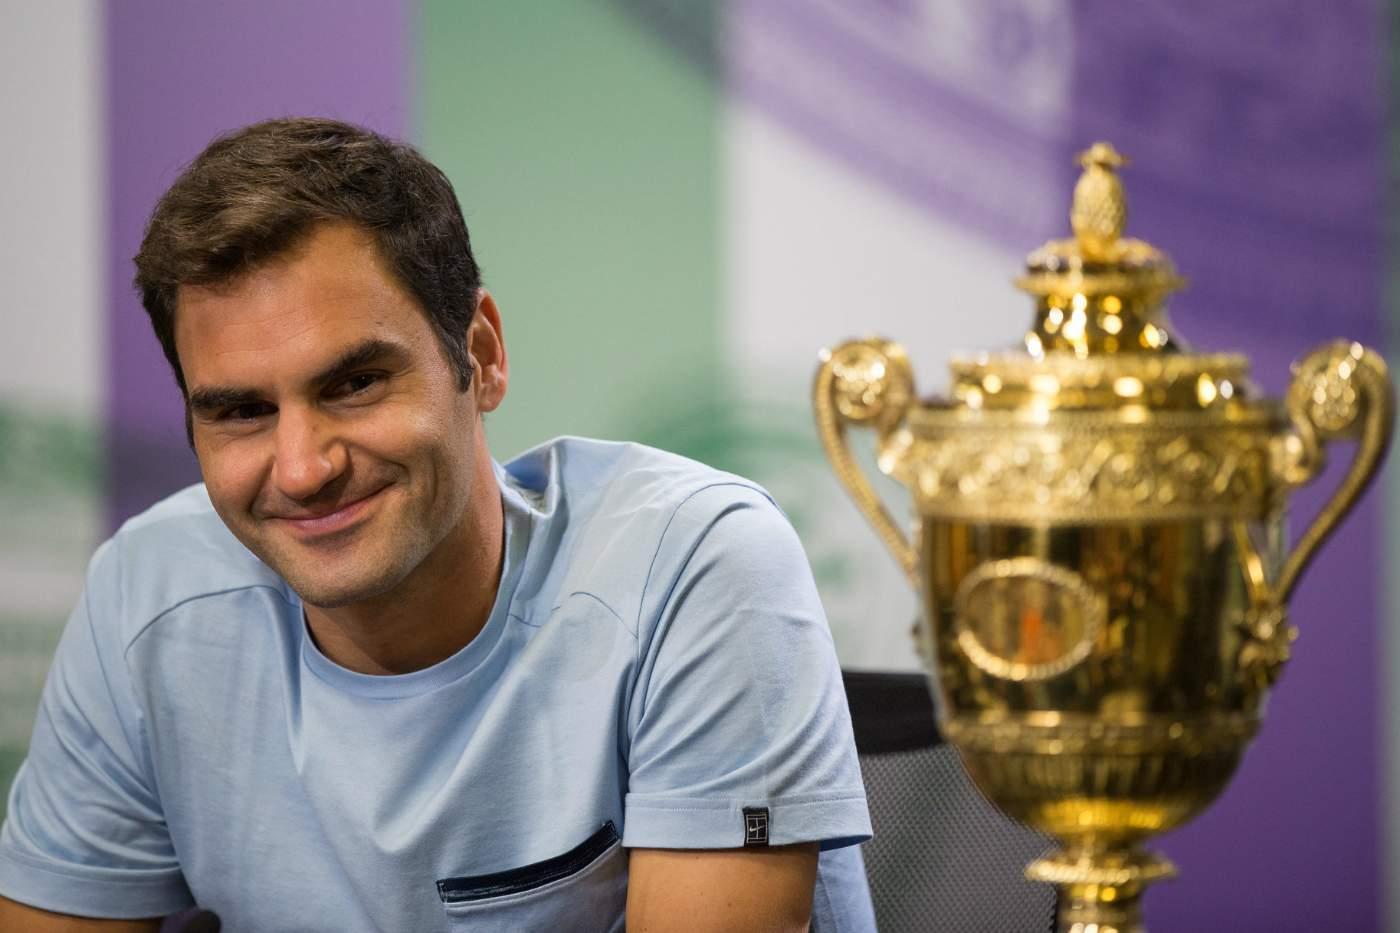 Швейцарец Федерер завоевал звание 3-й ракетки мира